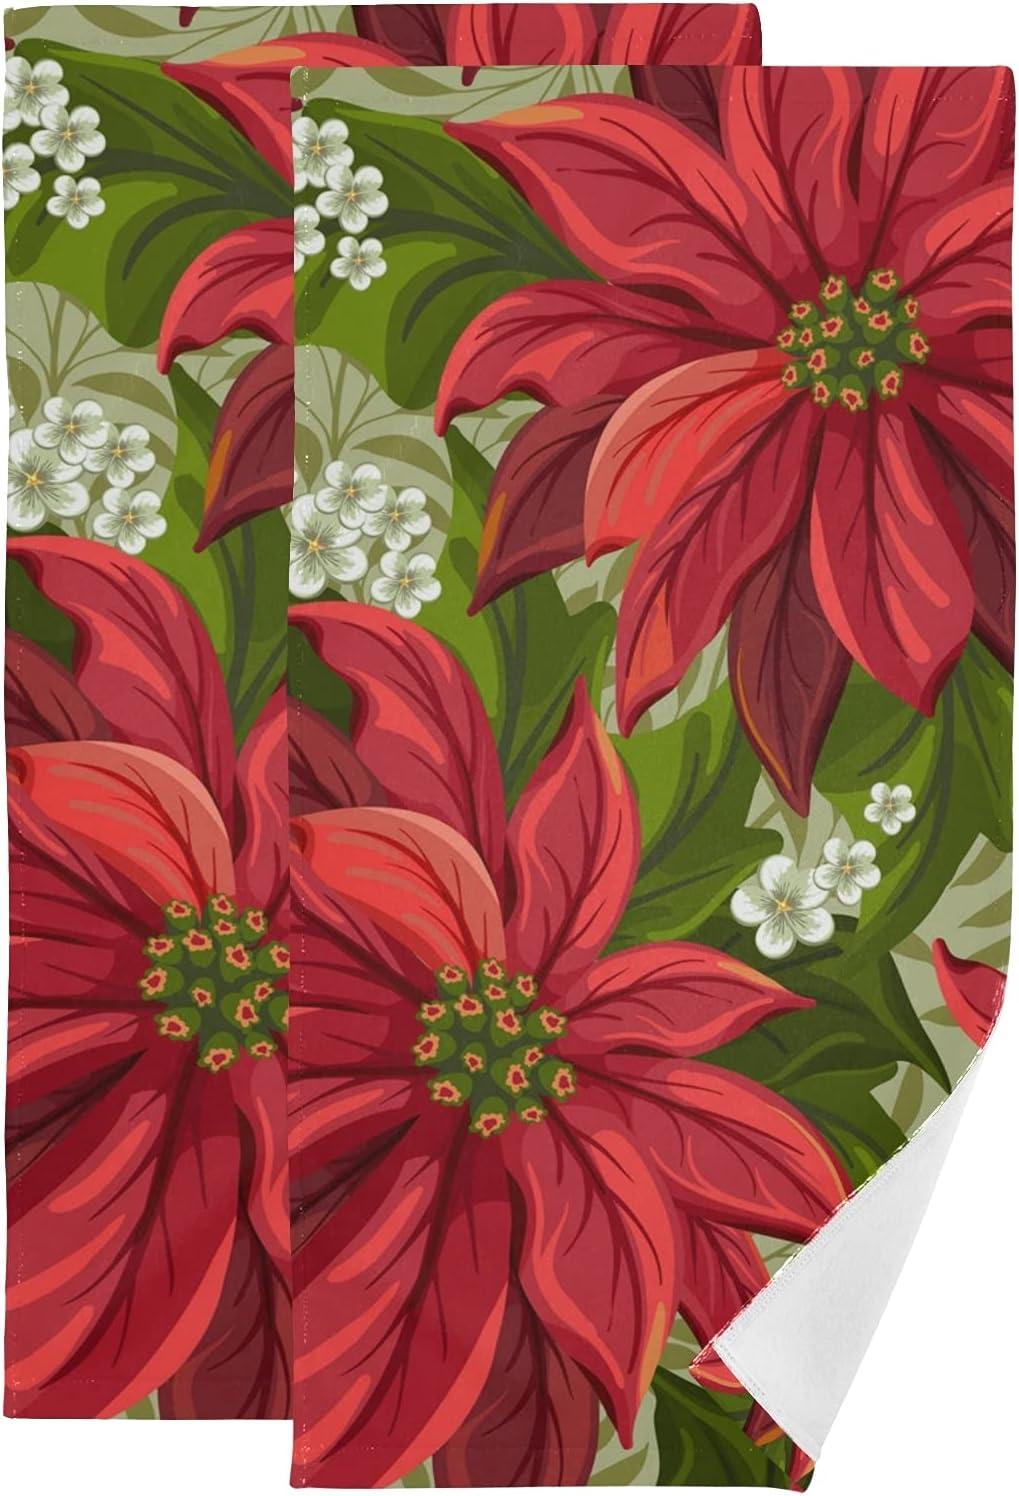 Towel Fees free Set Wonderful Poinsettia Christmas Lar 2021 autumn and winter new Flowers Towels Bath